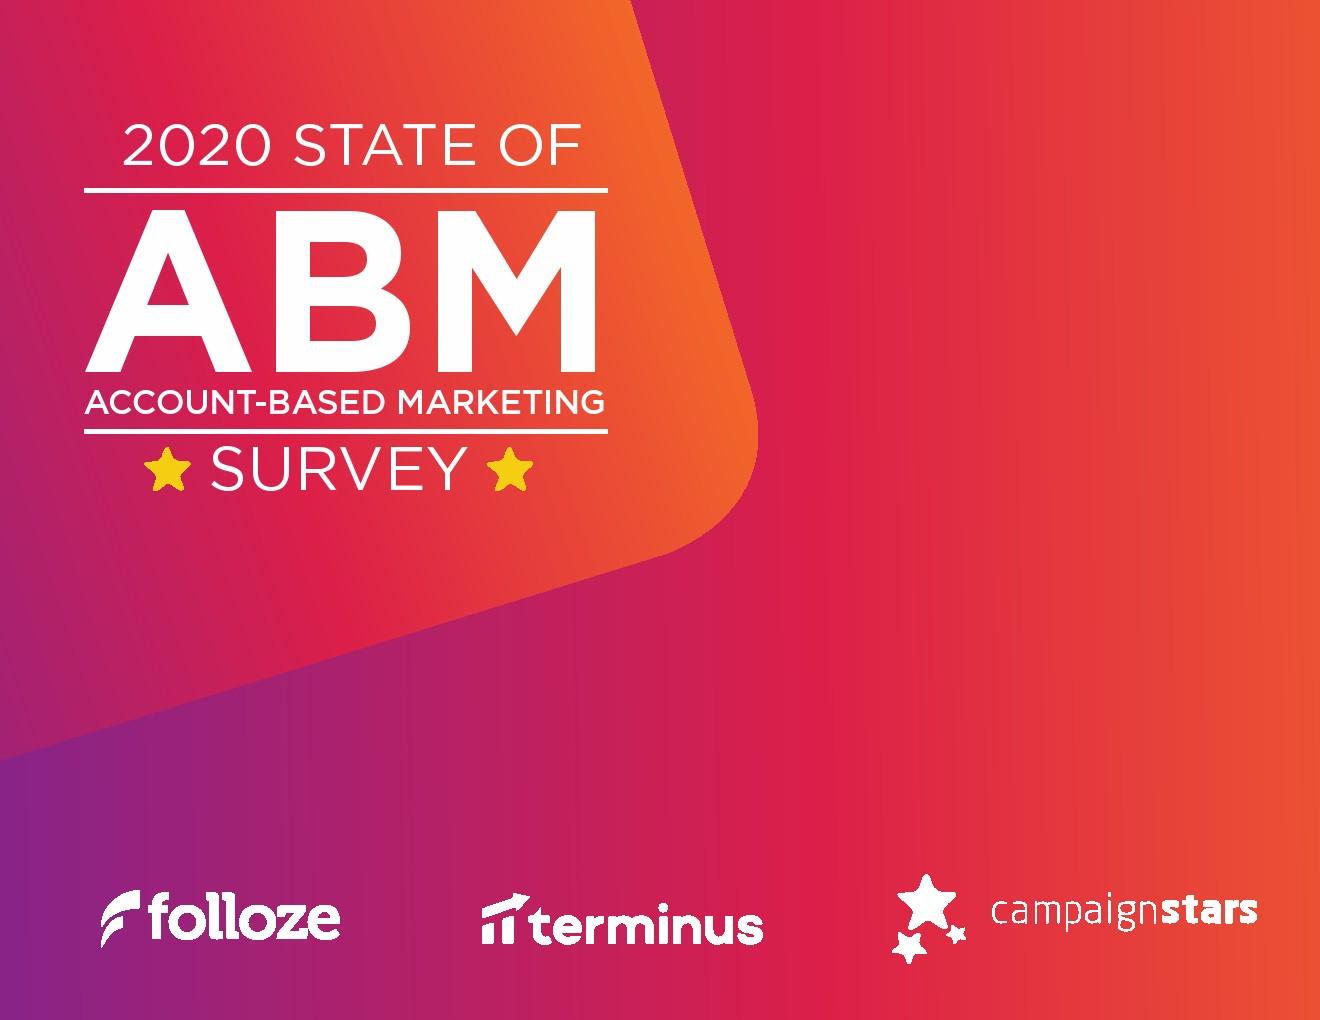 Campaign Stars:2020年基于账户的营销状态